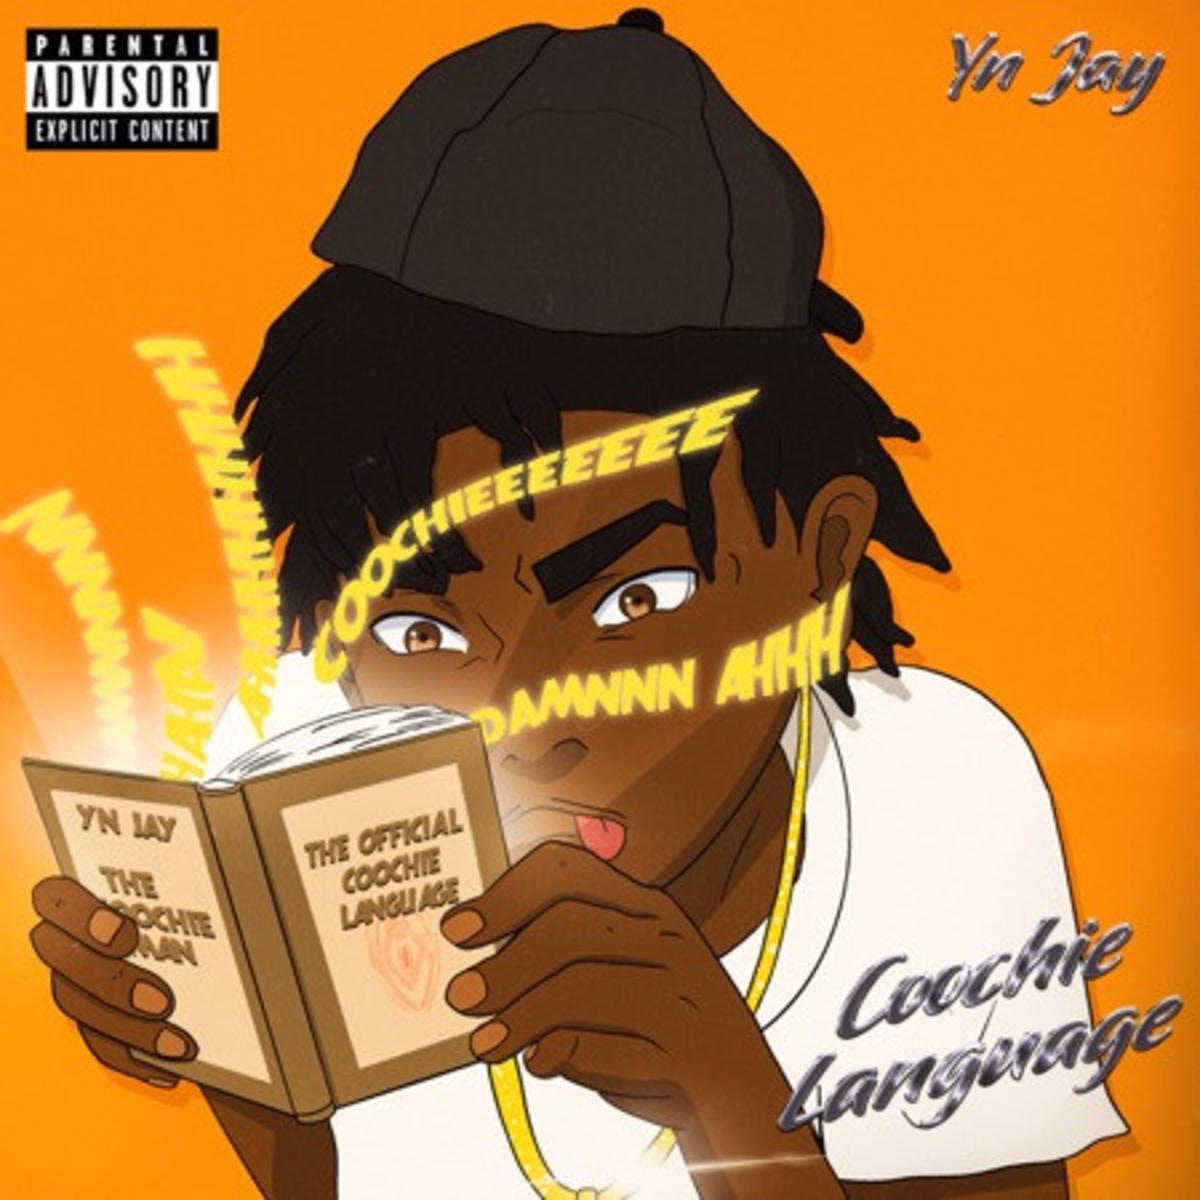 DOWNLOAD MP3: YN Jay – Coochie Language